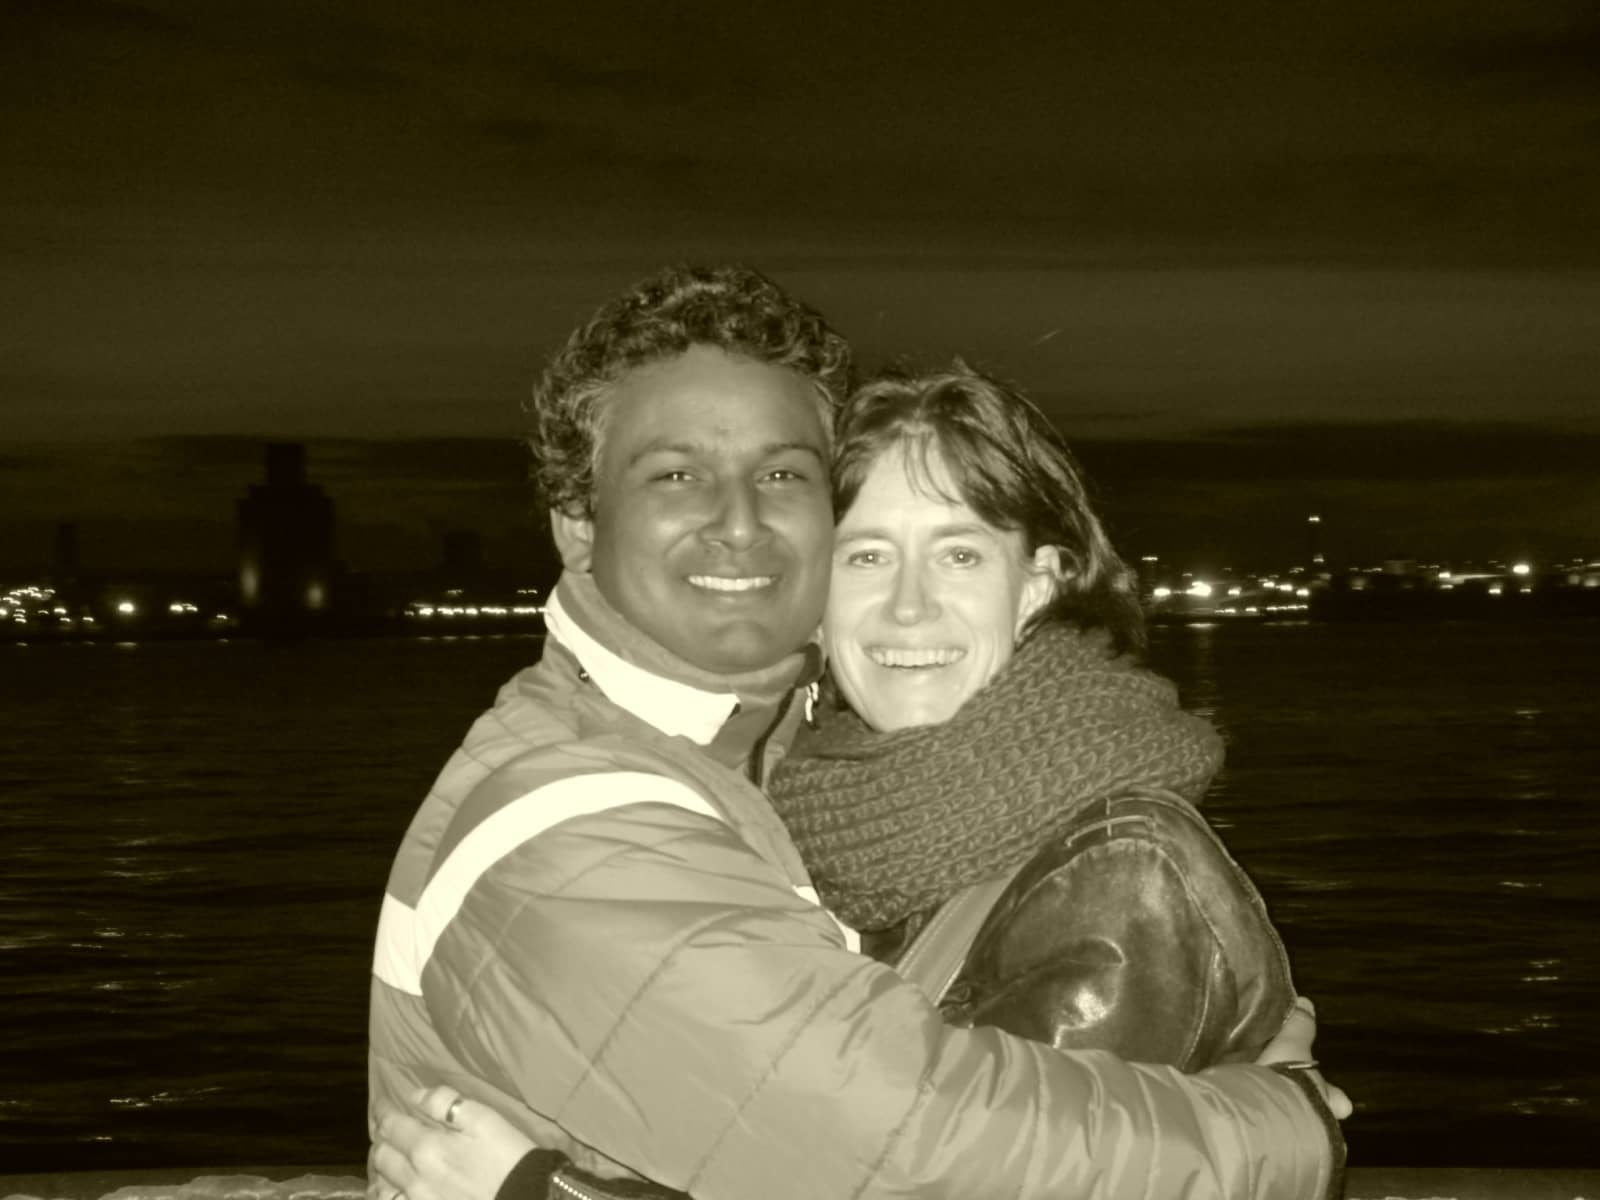 Hannah & Samuel from Hamburg, Germany